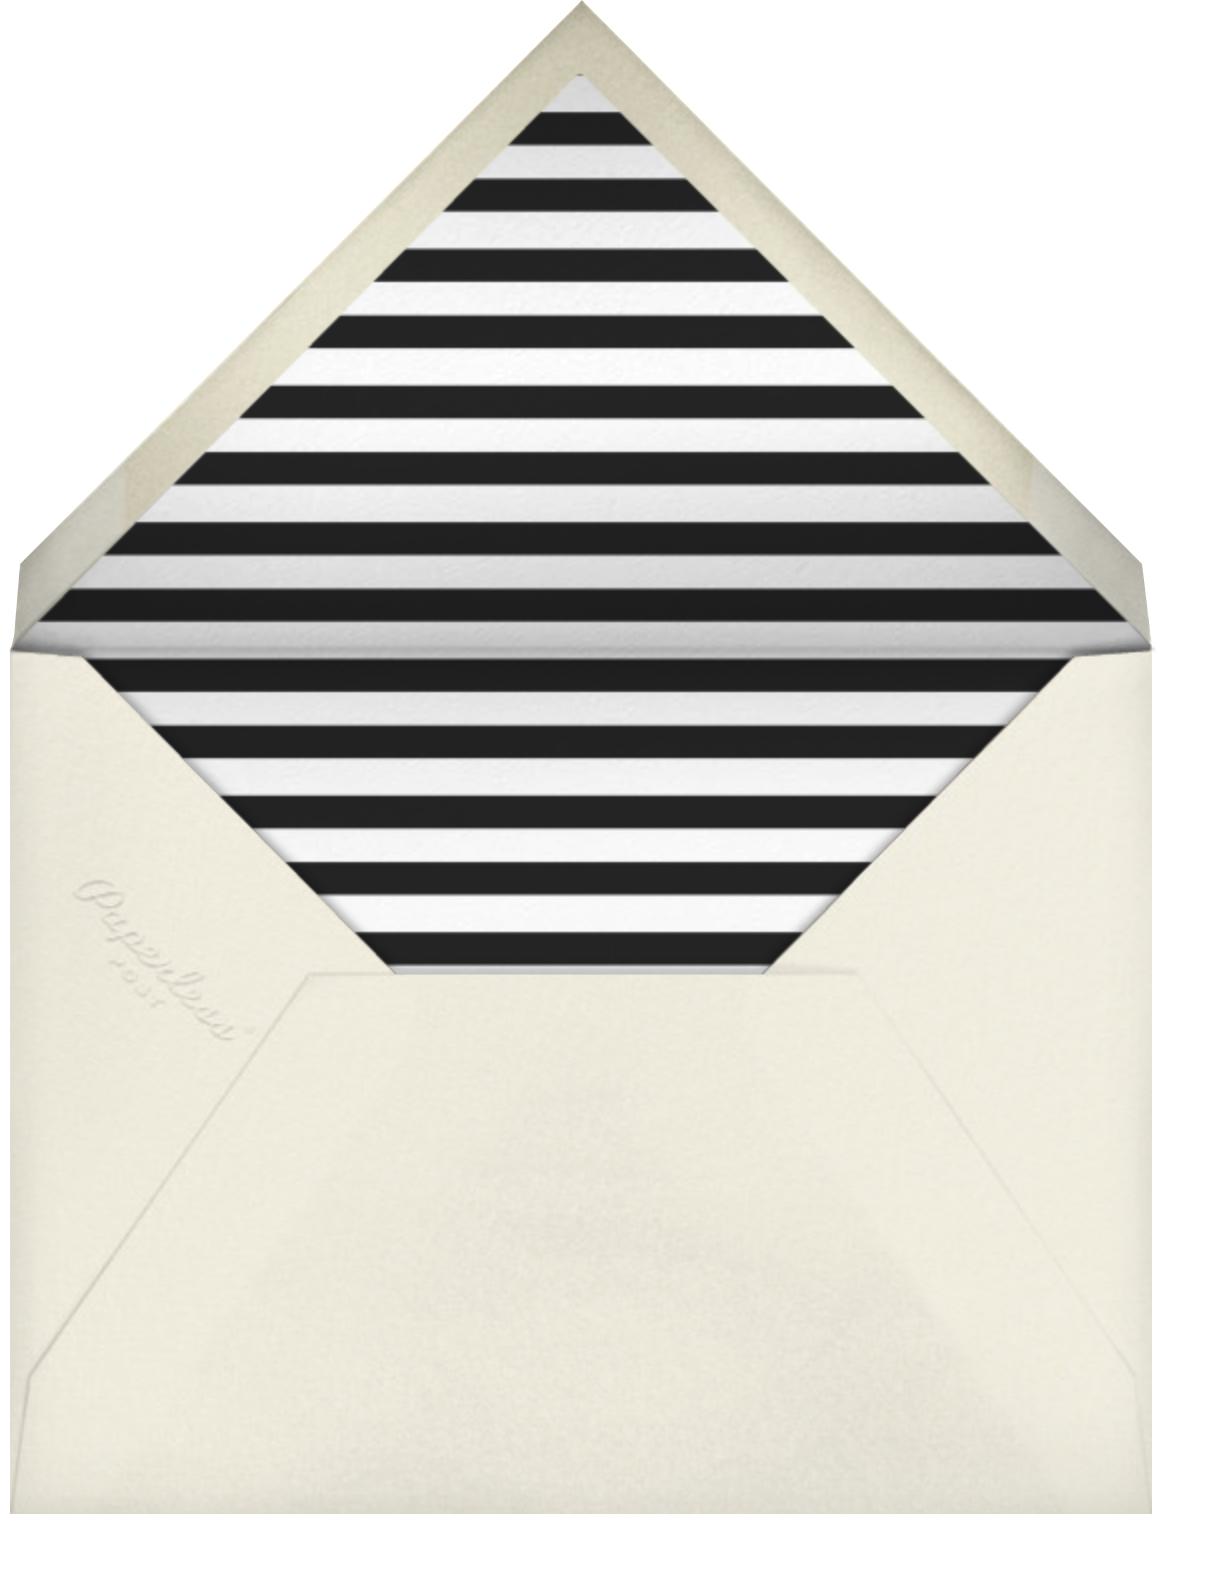 Typographic II (Invitation) - Gray - kate spade new york - All - envelope back